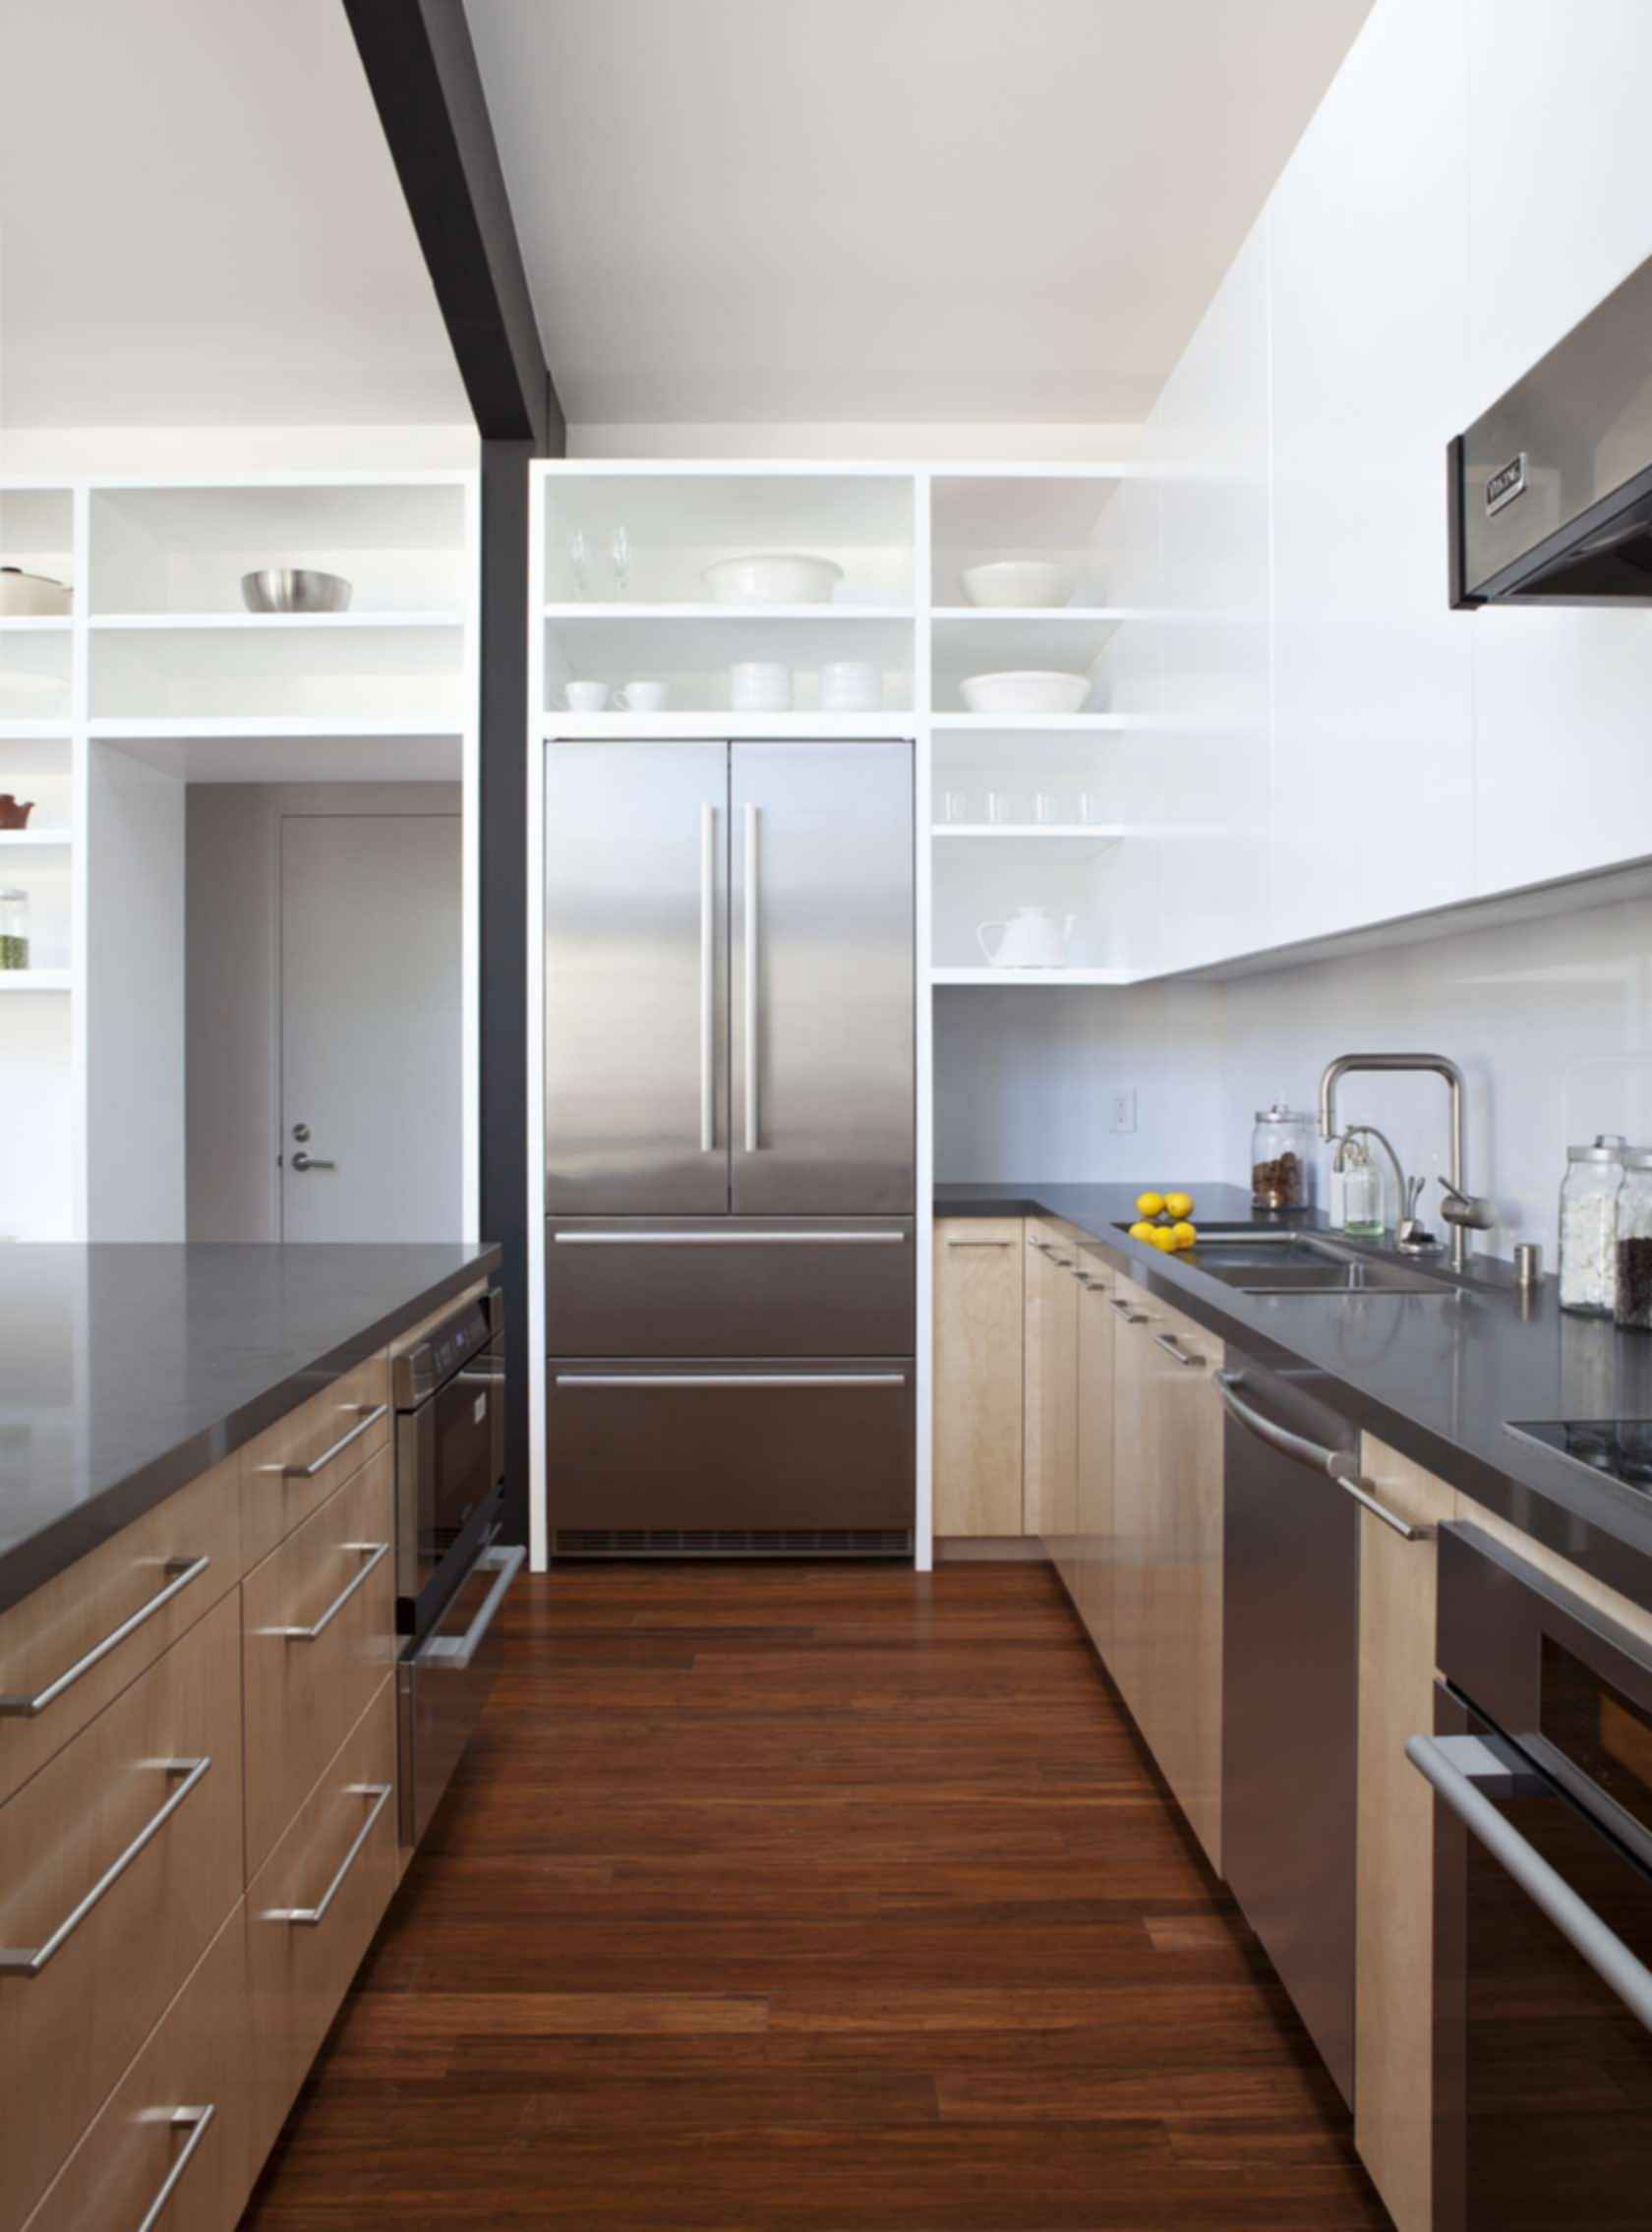 Net Zero Energy House - Interior/Kitchen